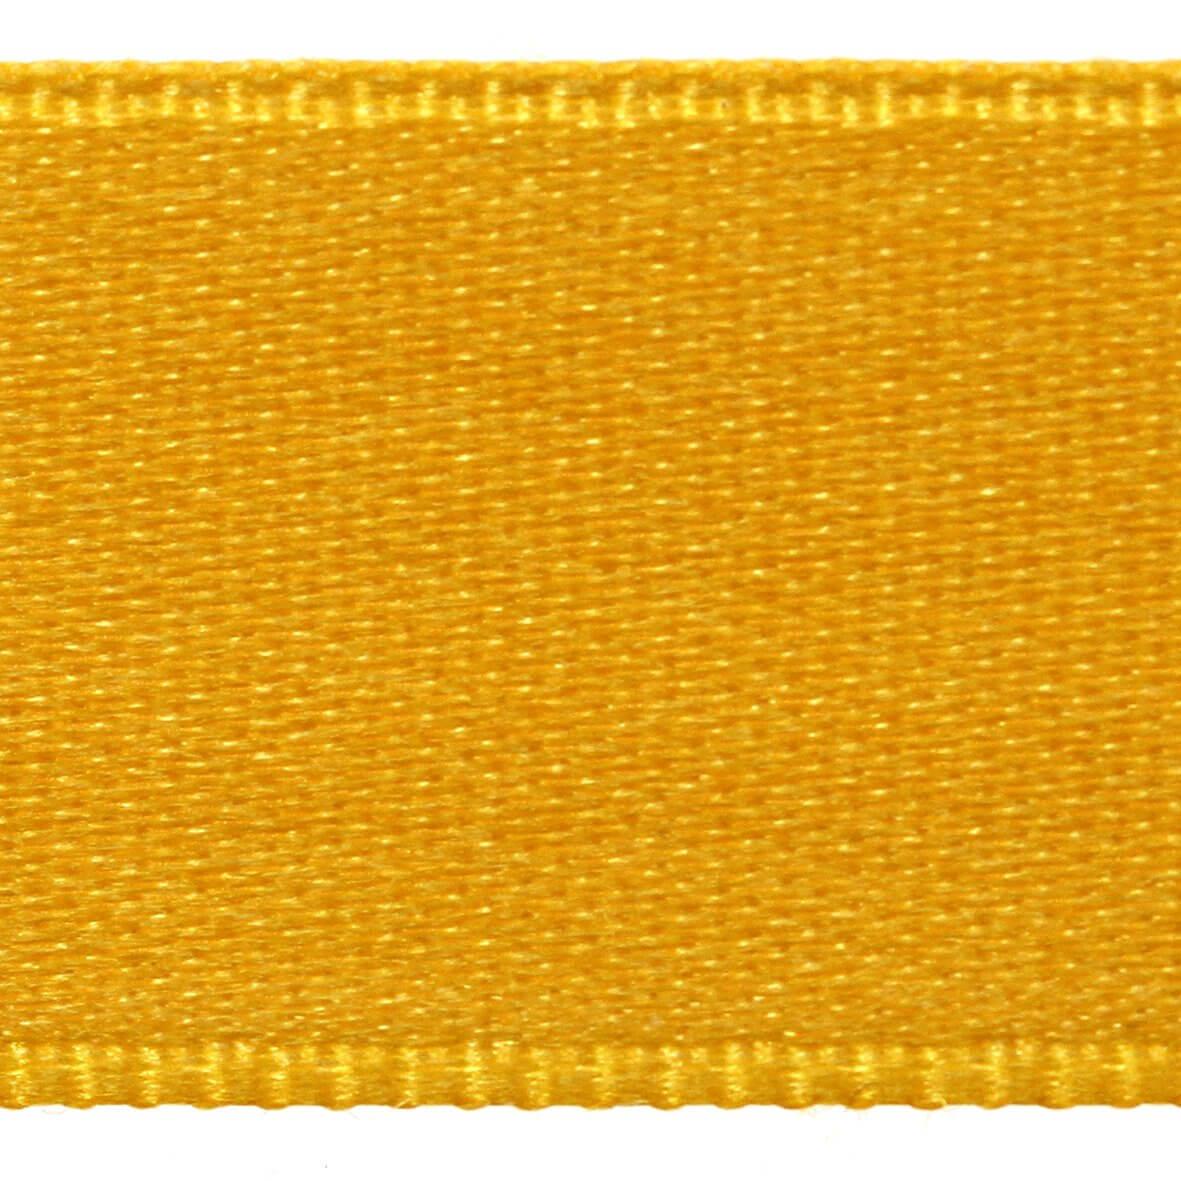 Taxicab Yellow Col. 218 - 15mm Satab Satin Ribbon